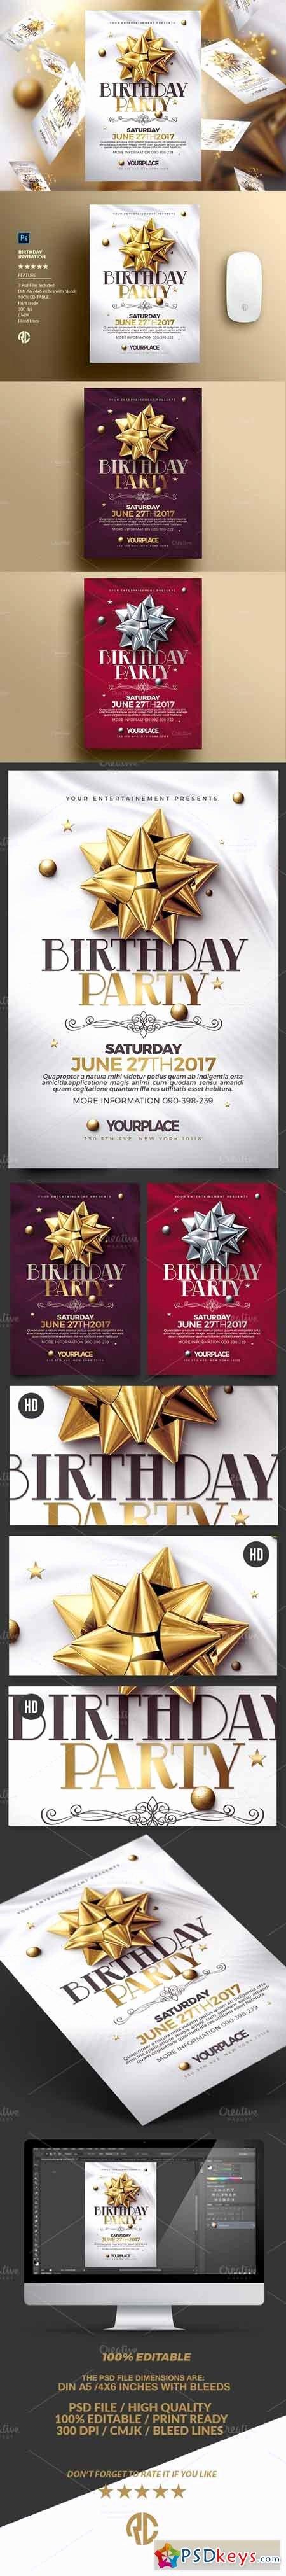 Photoshop Birthday Invitation Template Best Of Birthday Invitation 3 Psd Template Free Download